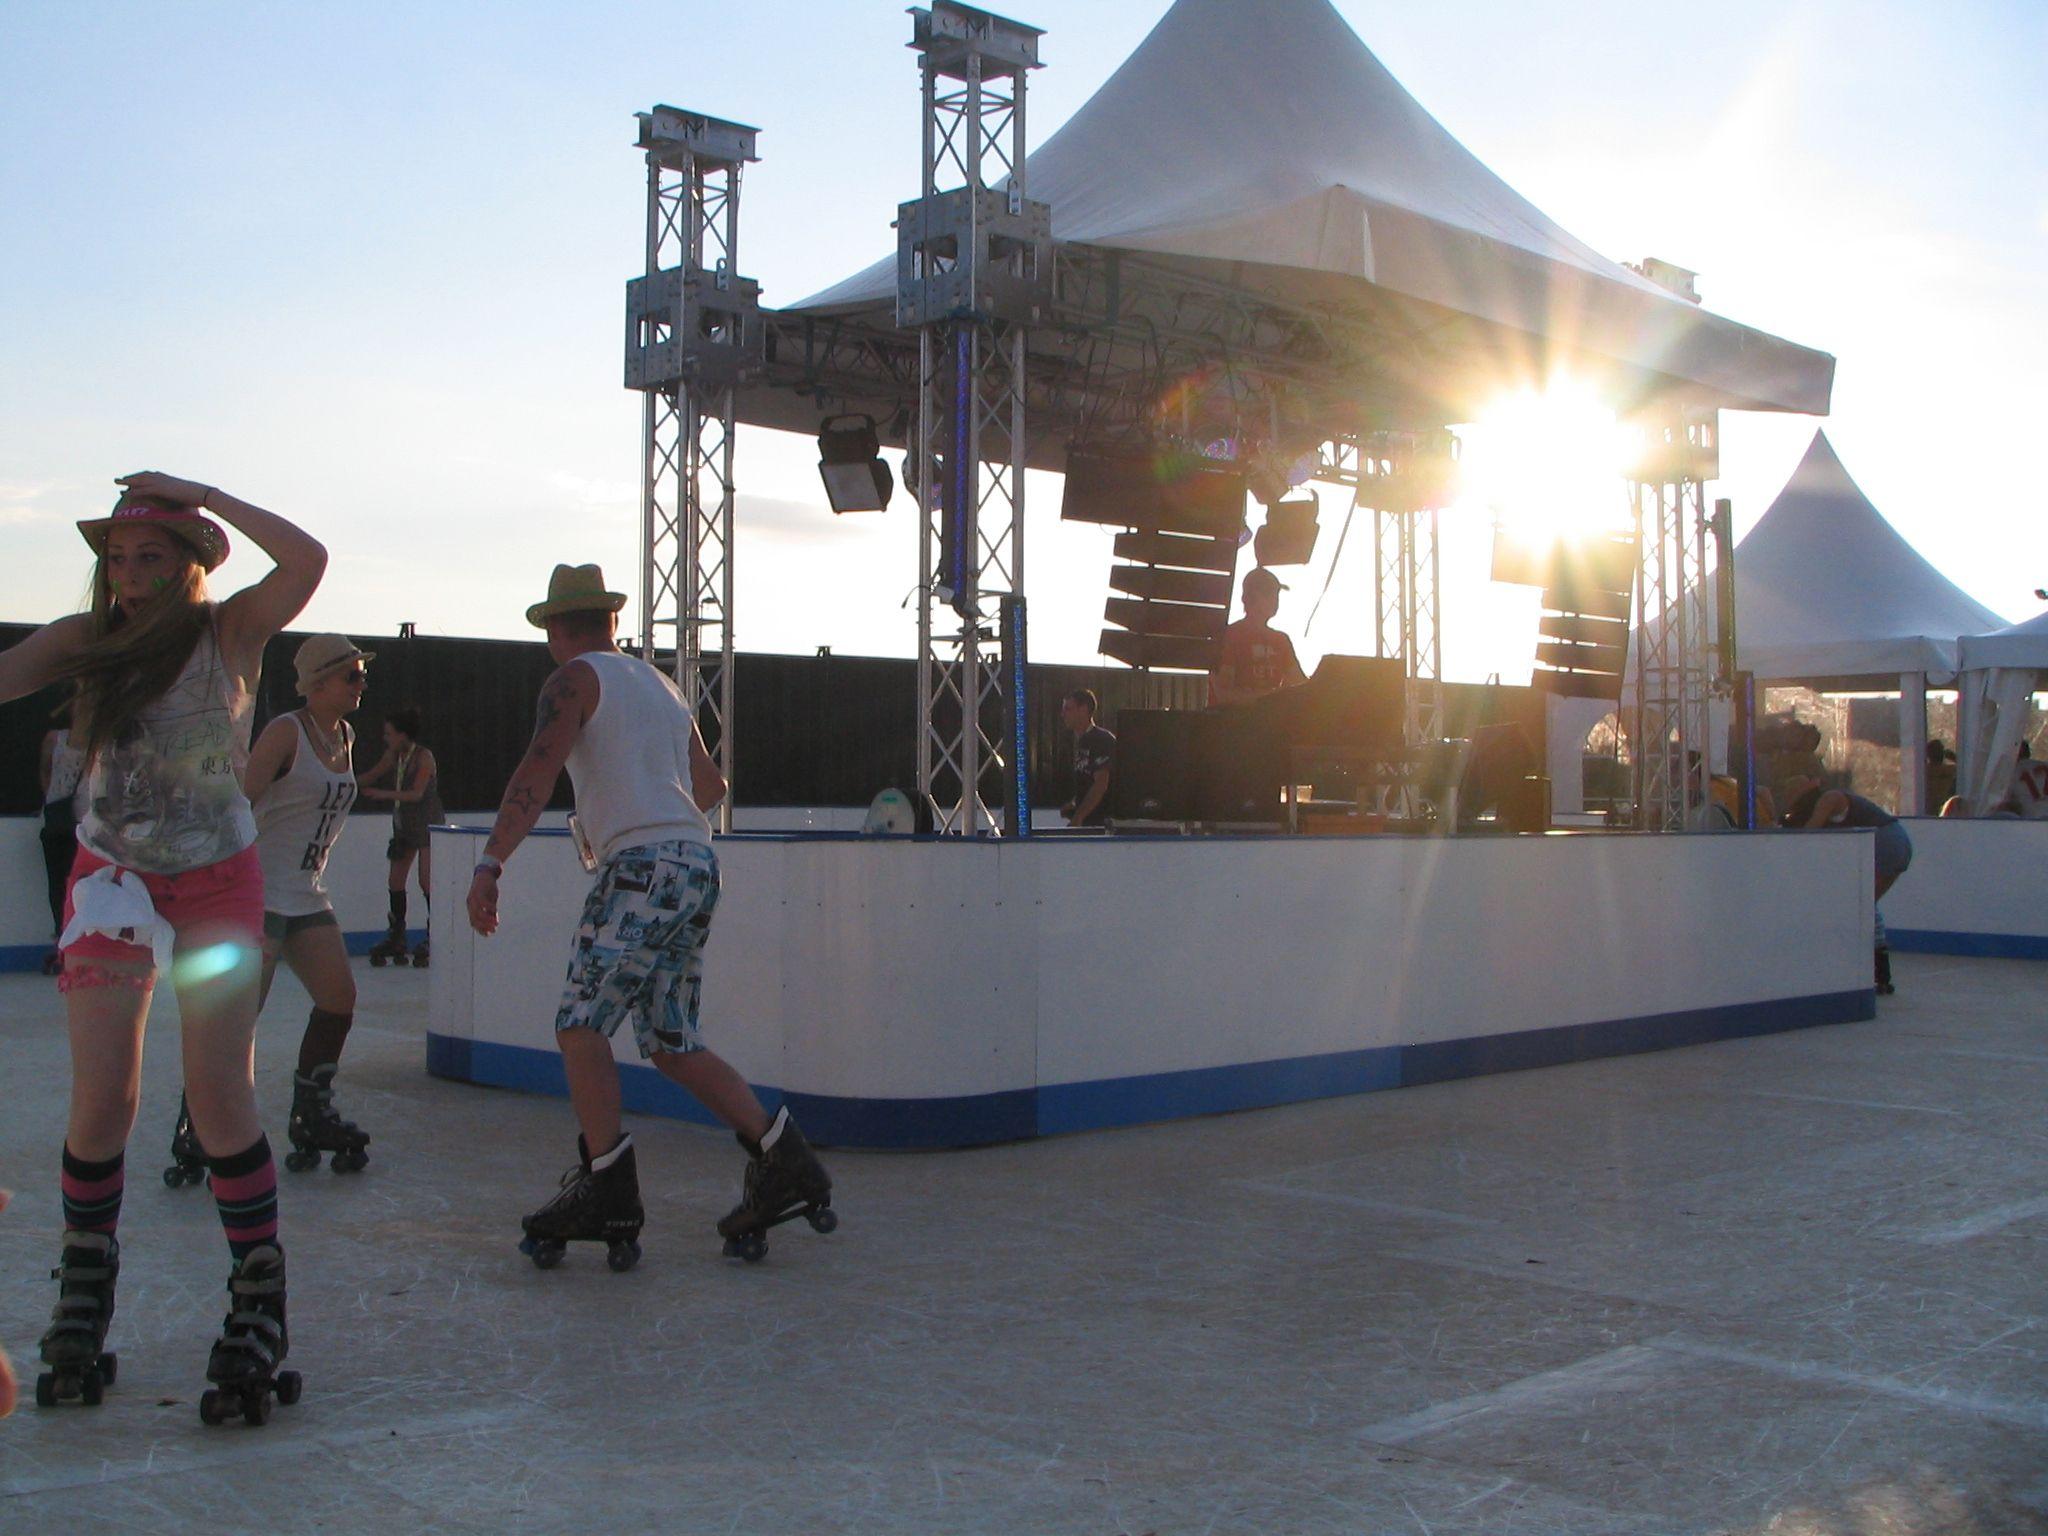 Roller skating rink hire - Roller Skating Roller Rink Hire